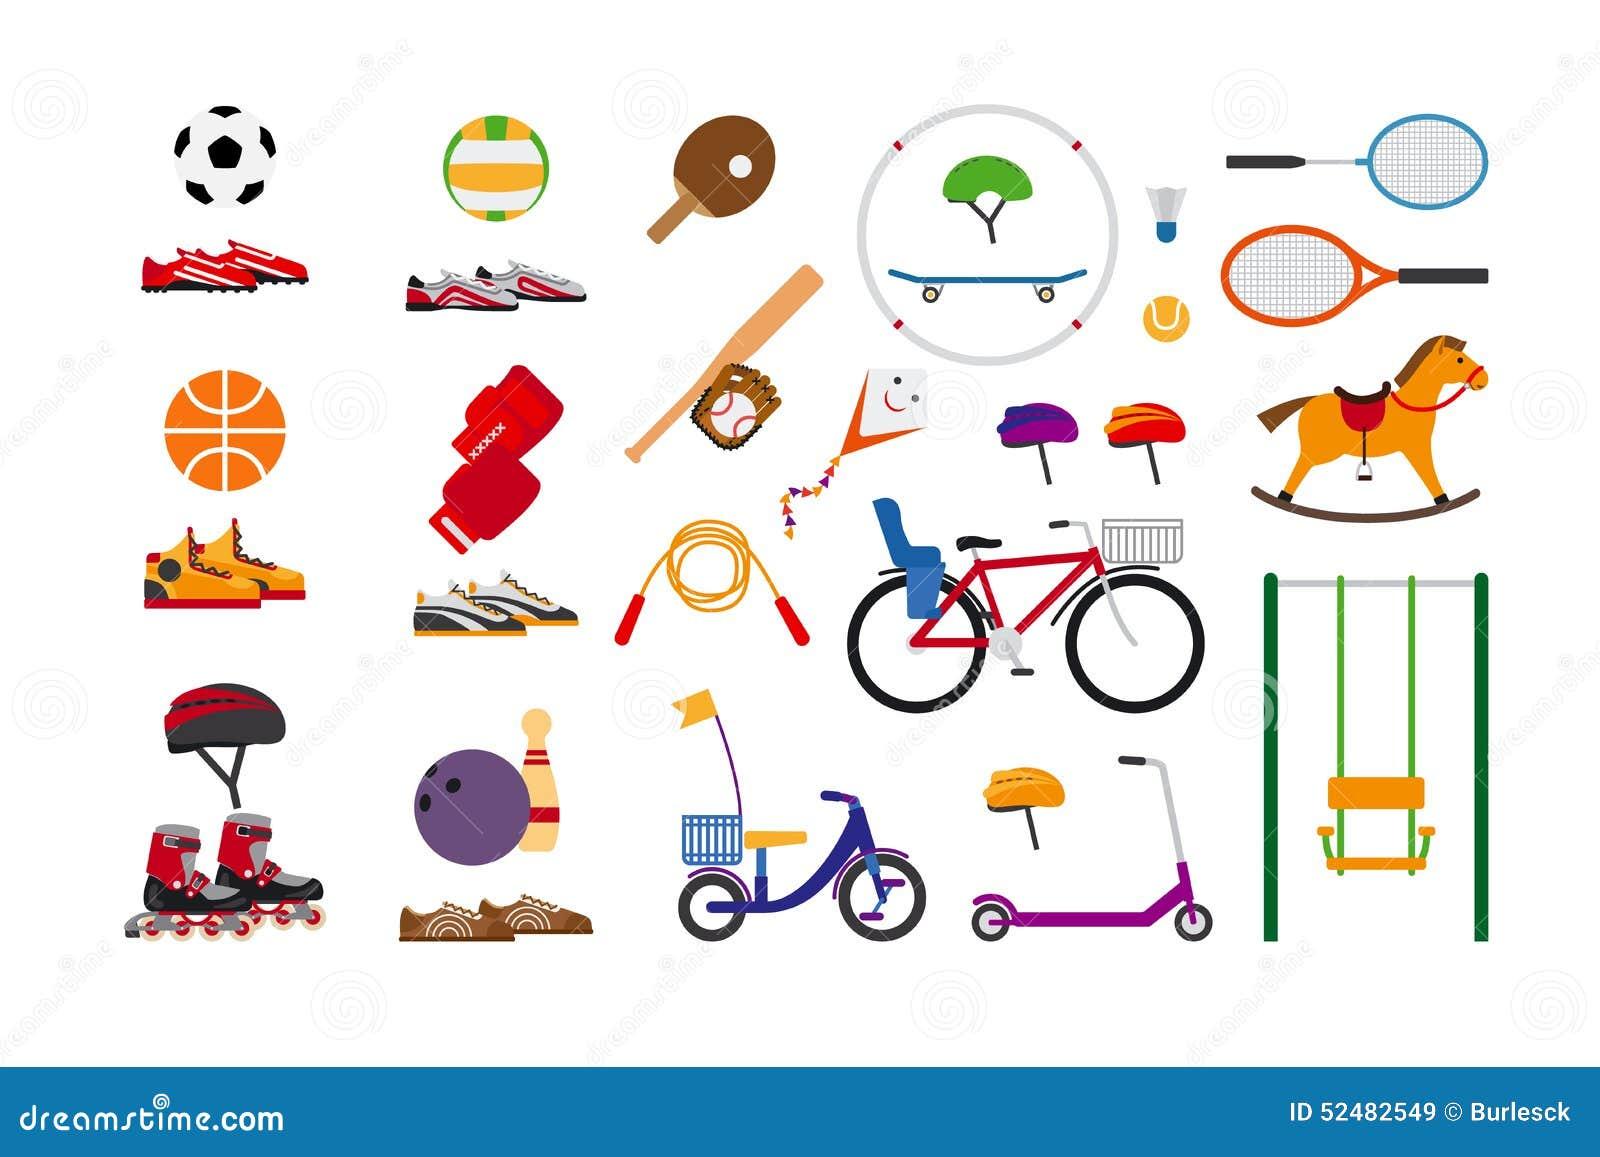 Волейбол  обои и картинки на рабочий стол